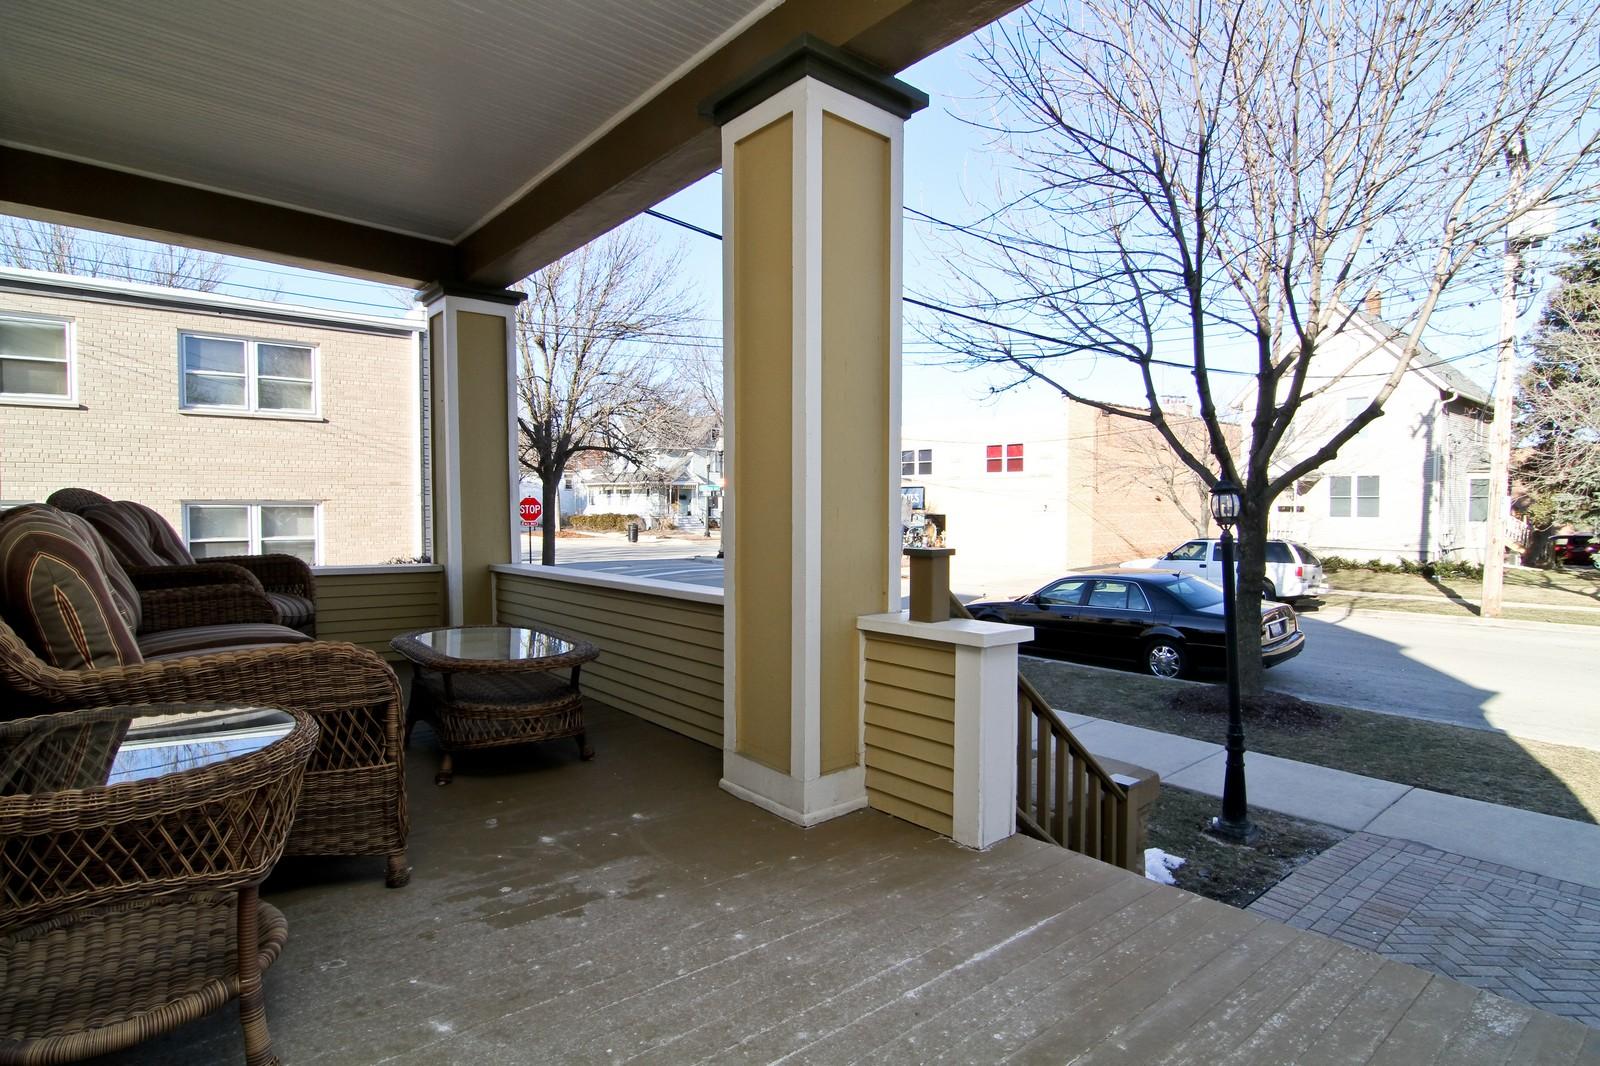 Real Estate Photography - 310 S Hale St, Wheaton, IL, 60187 - Porch